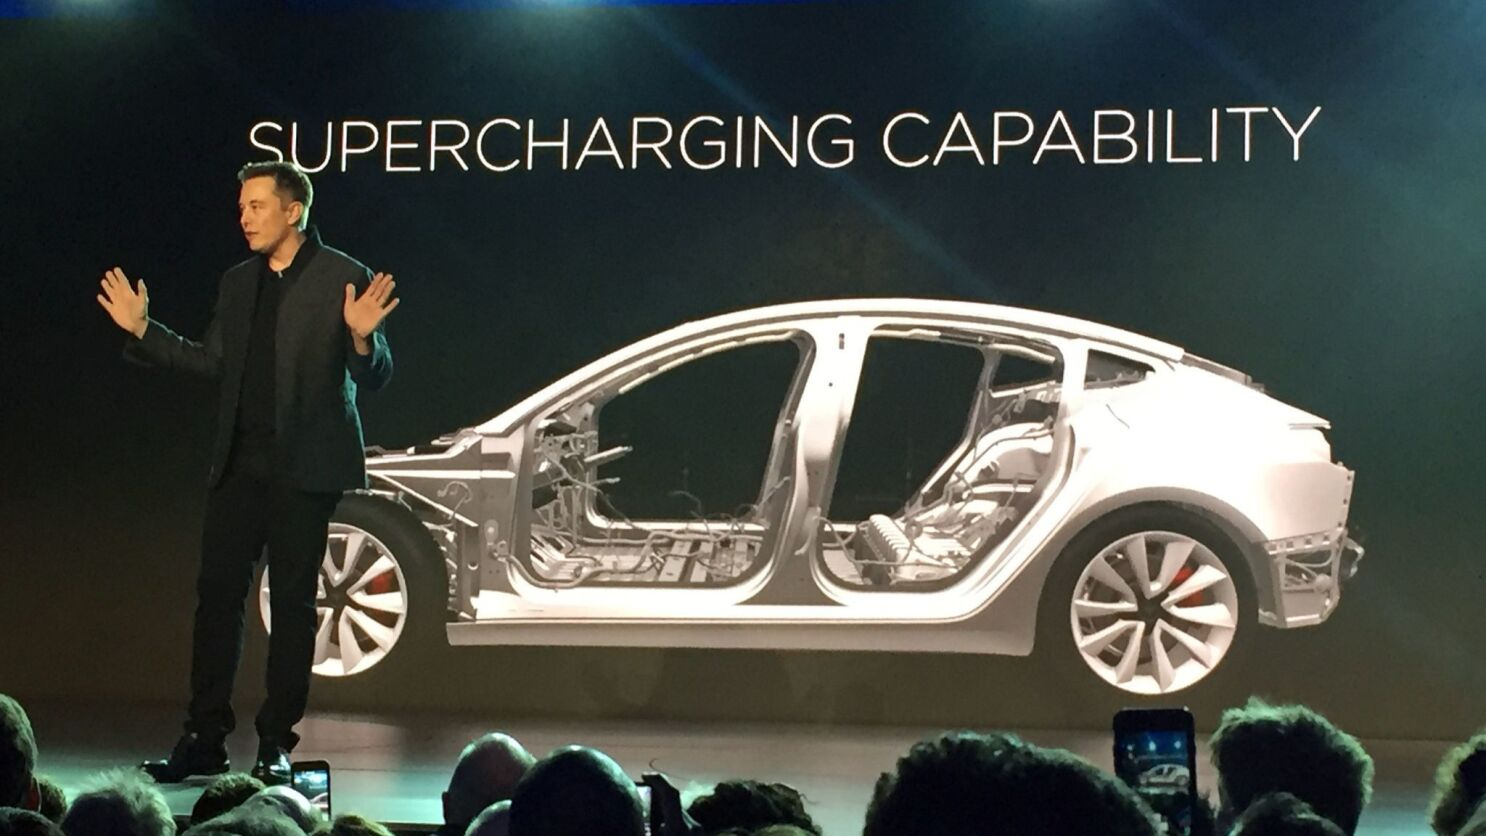 Column: California fires a shot at Tesla over its labor